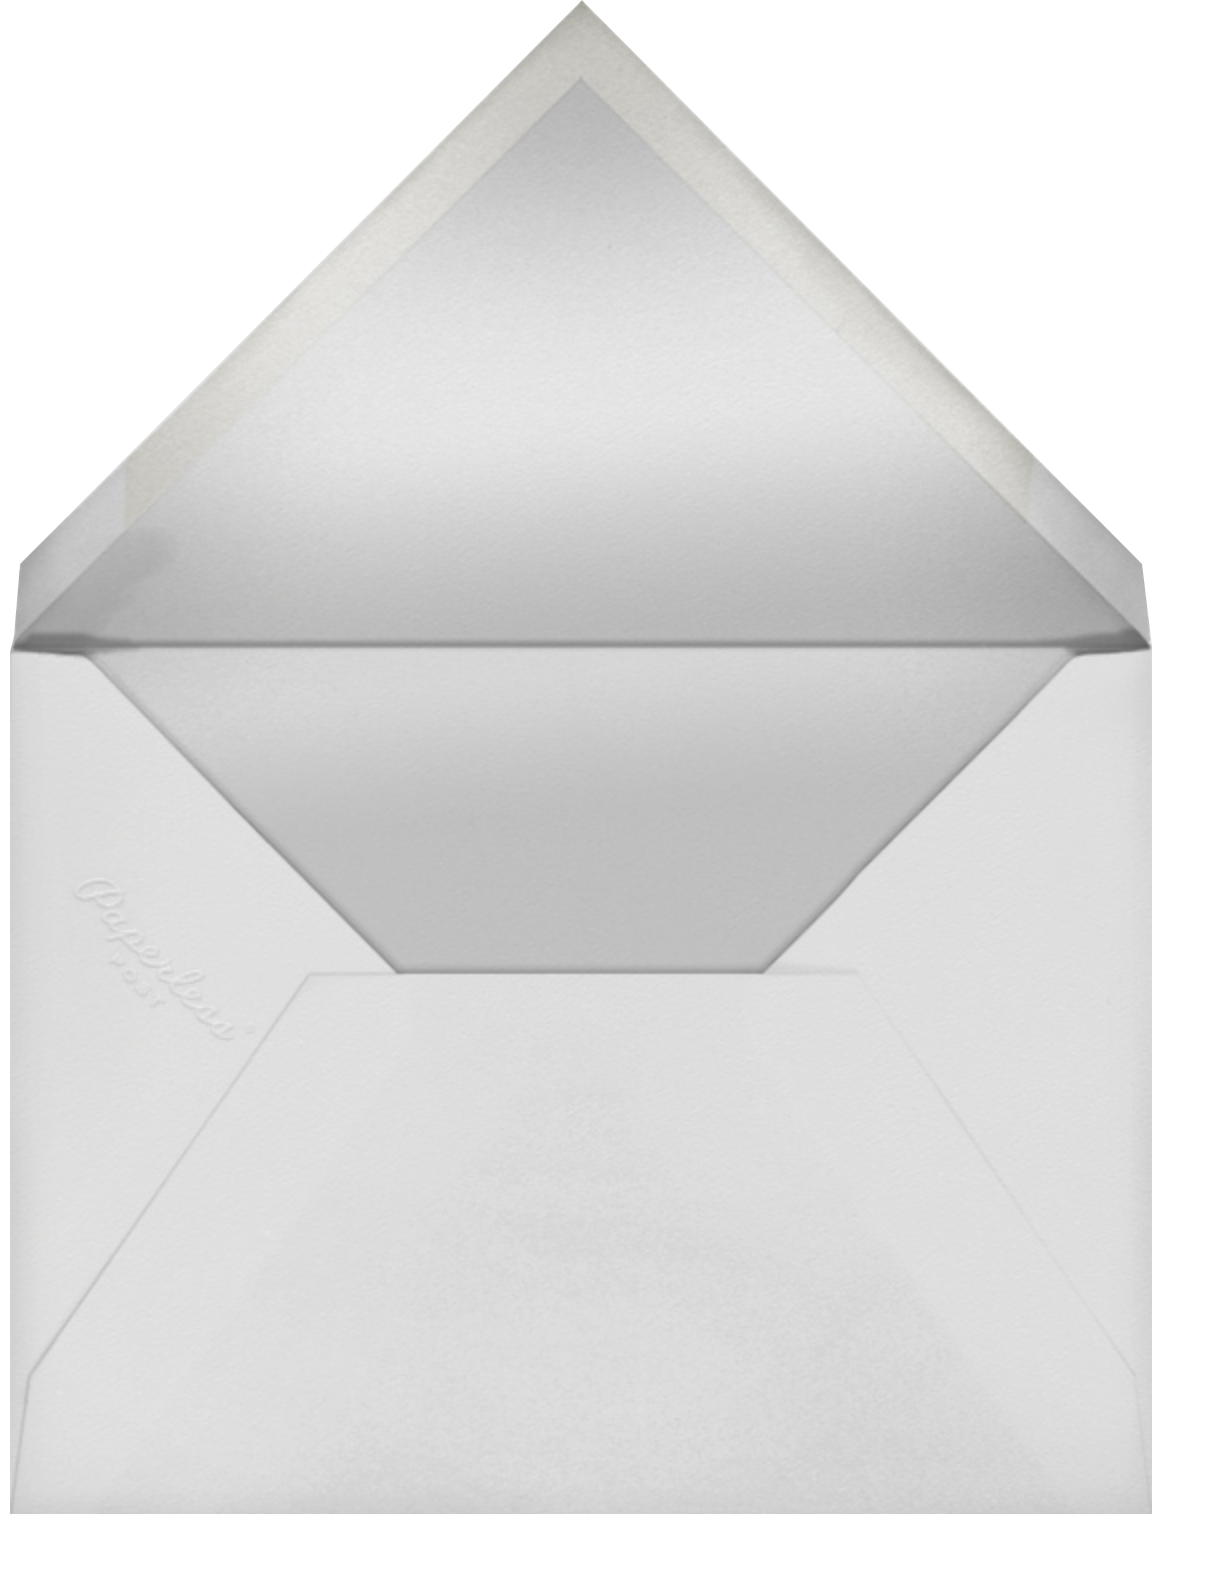 Palermo (Menu) - Silver - Paperless Post - Menus - envelope back